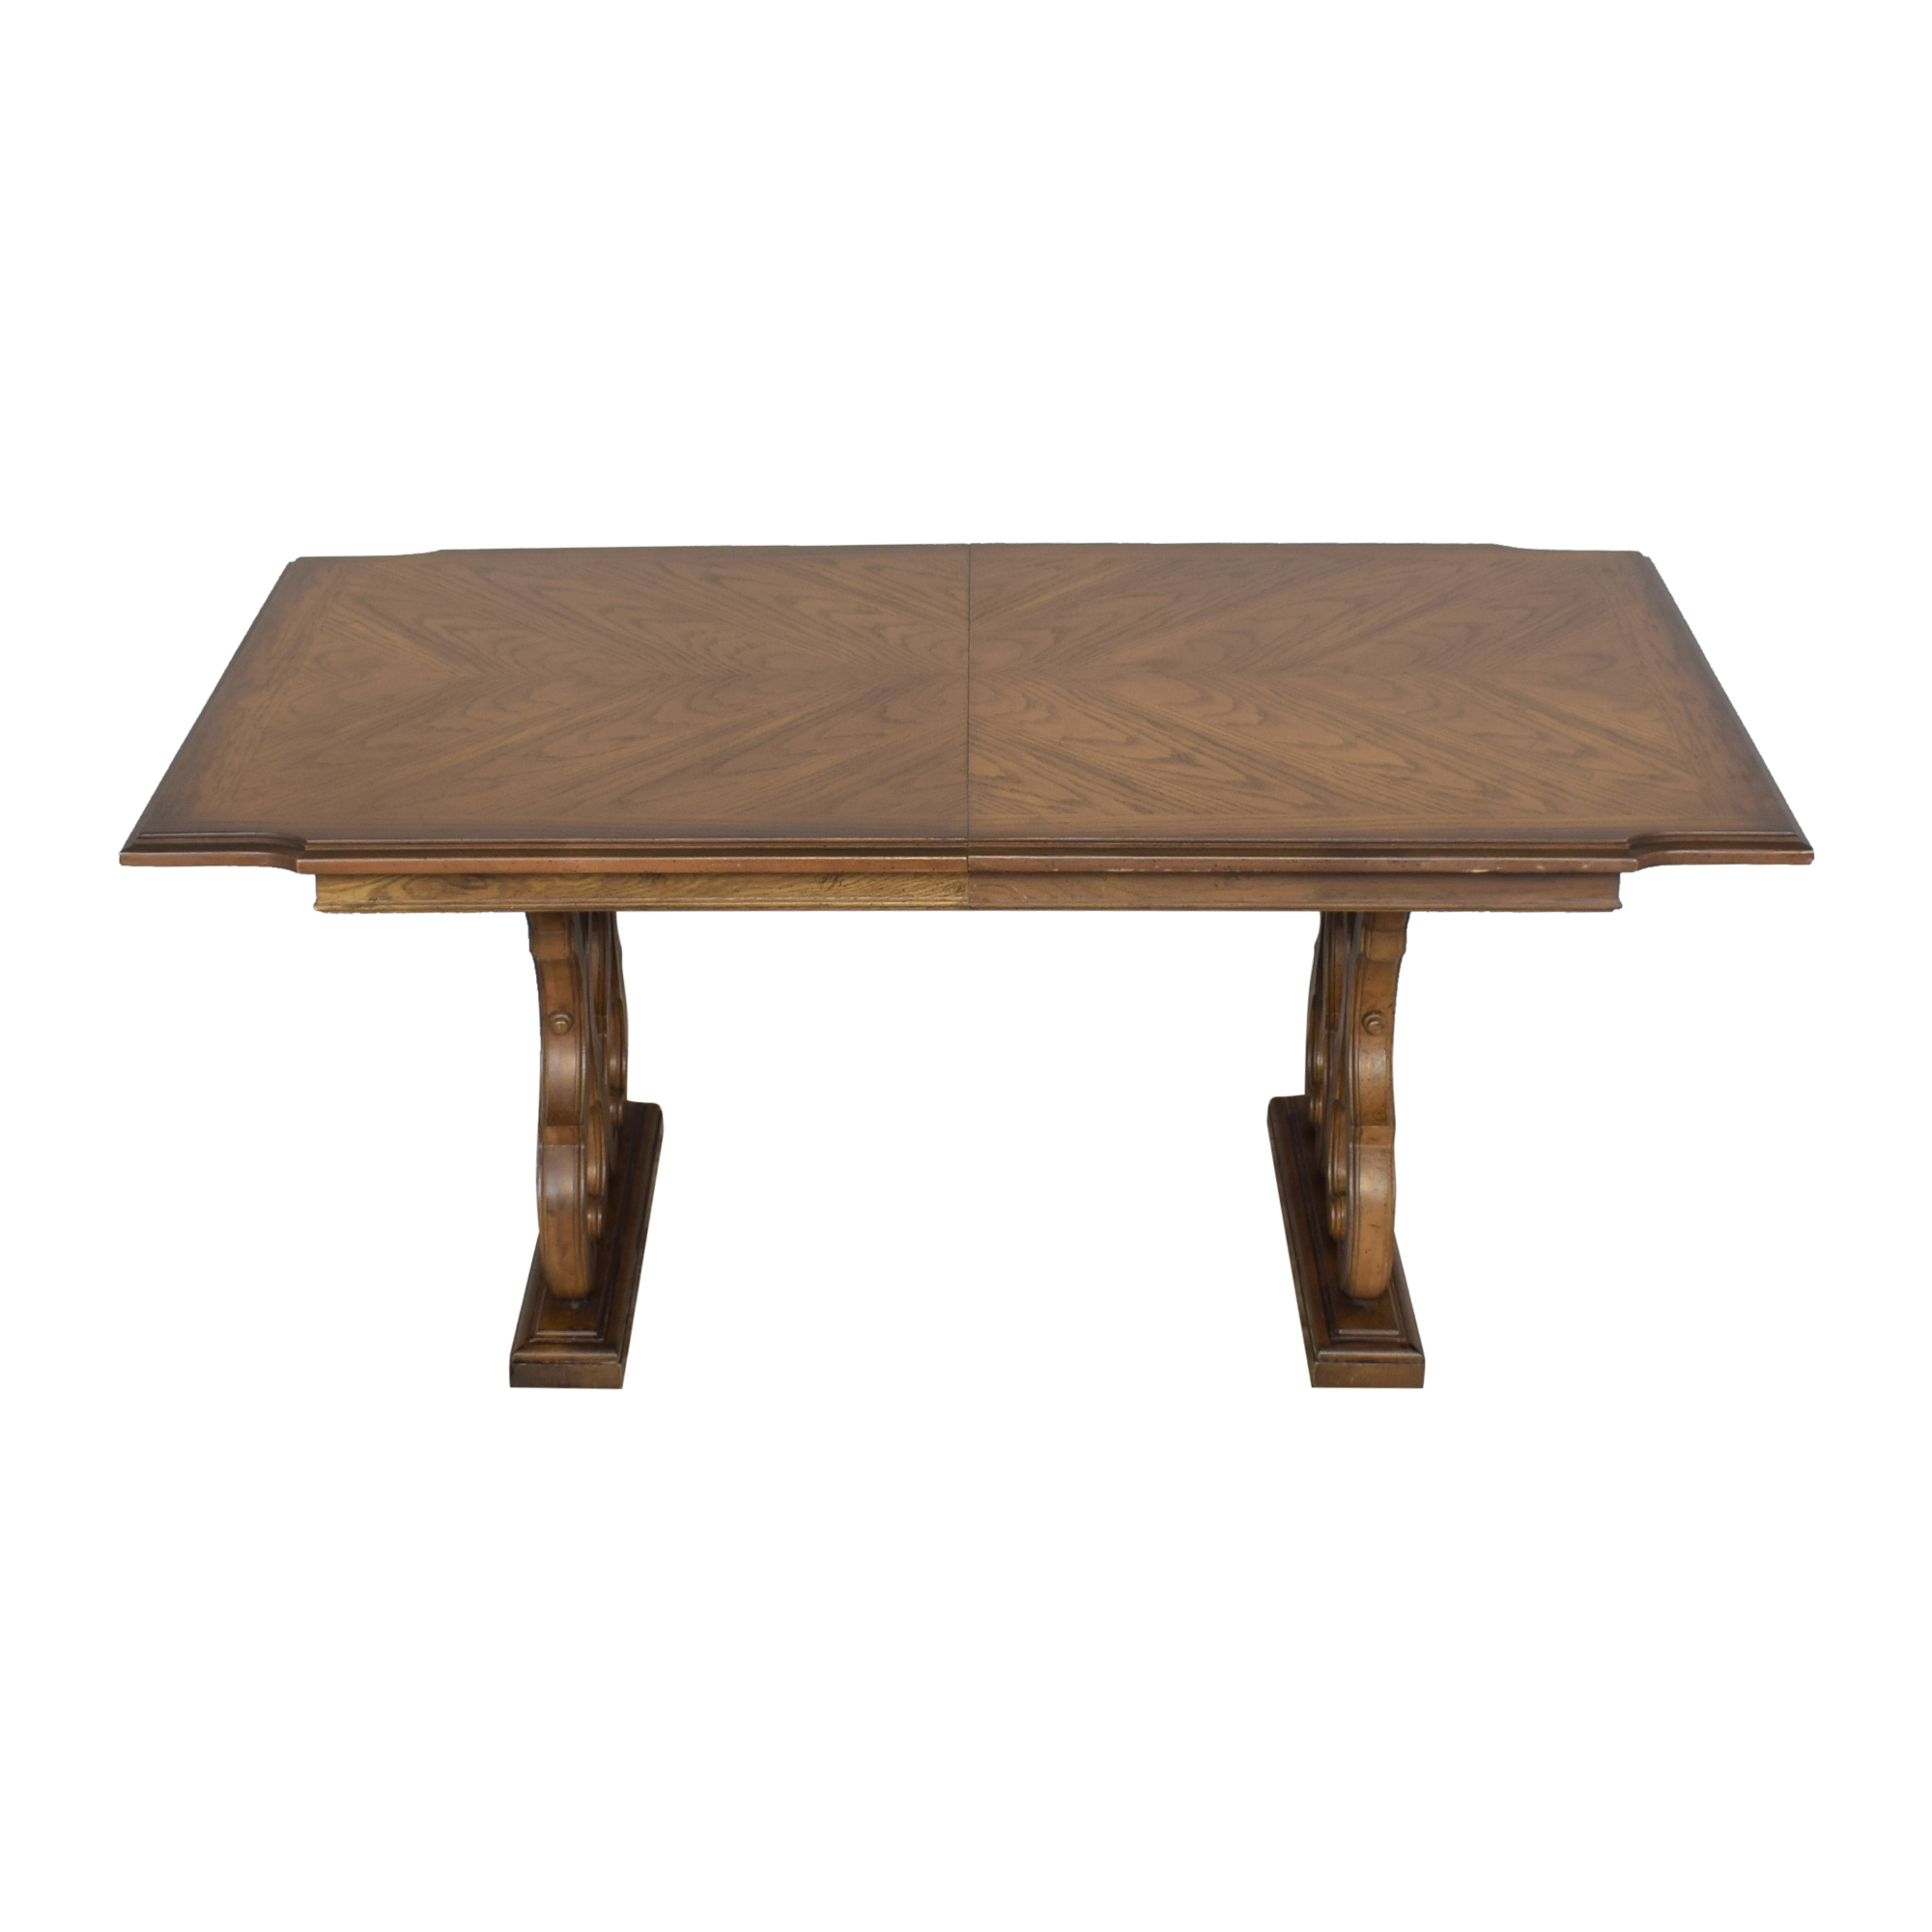 Huffman Koos Huffman Koos Two Pedestal Extending Dining Table nyc